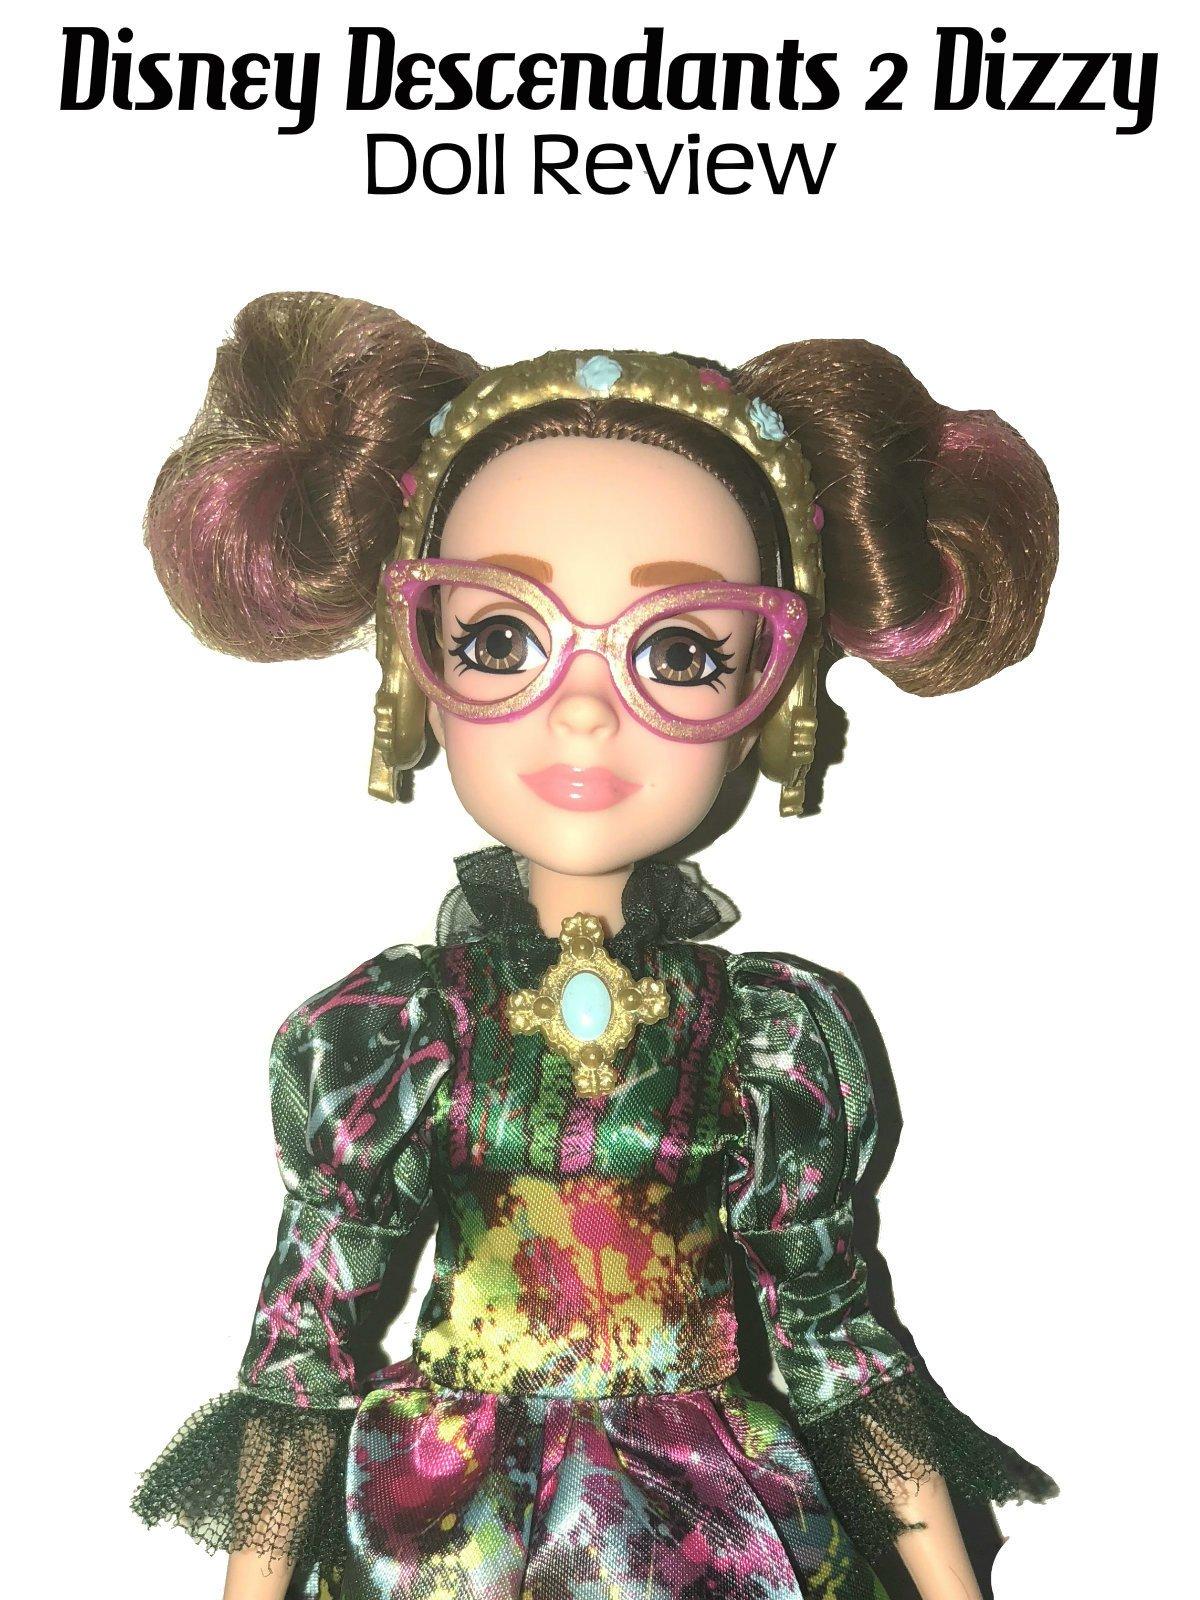 Review: Disney Descendants 2 Dizzy Doll Review on Amazon Prime Video UK